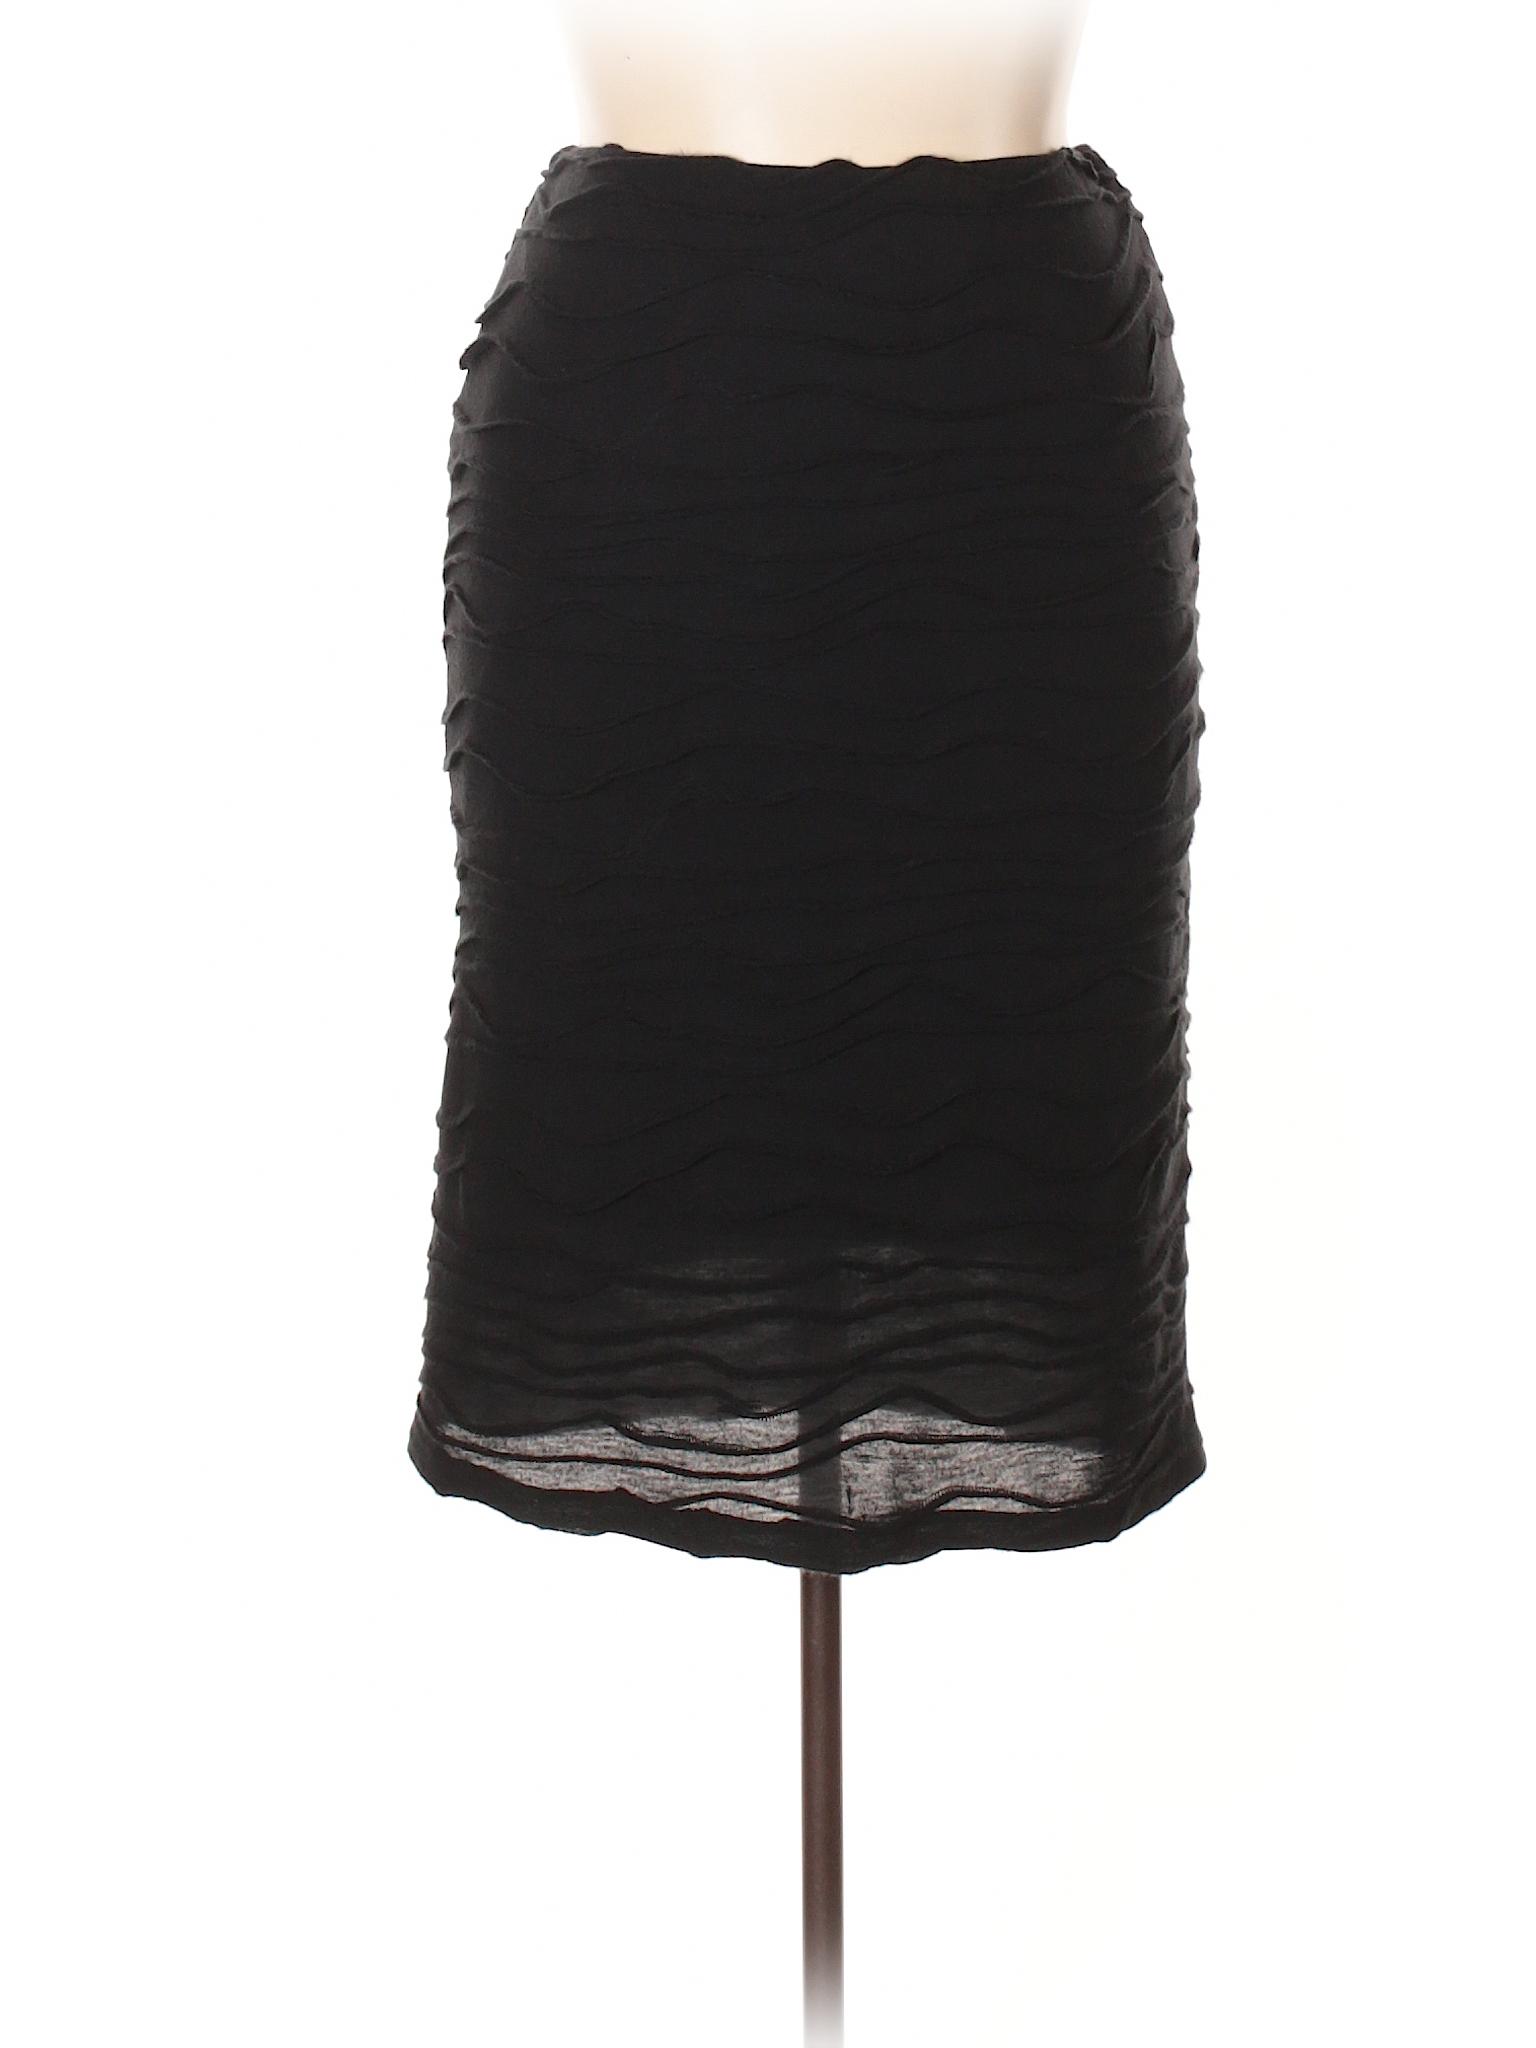 Skirt Ronen Chen leisure Casual Boutique 8qwx7ACwa